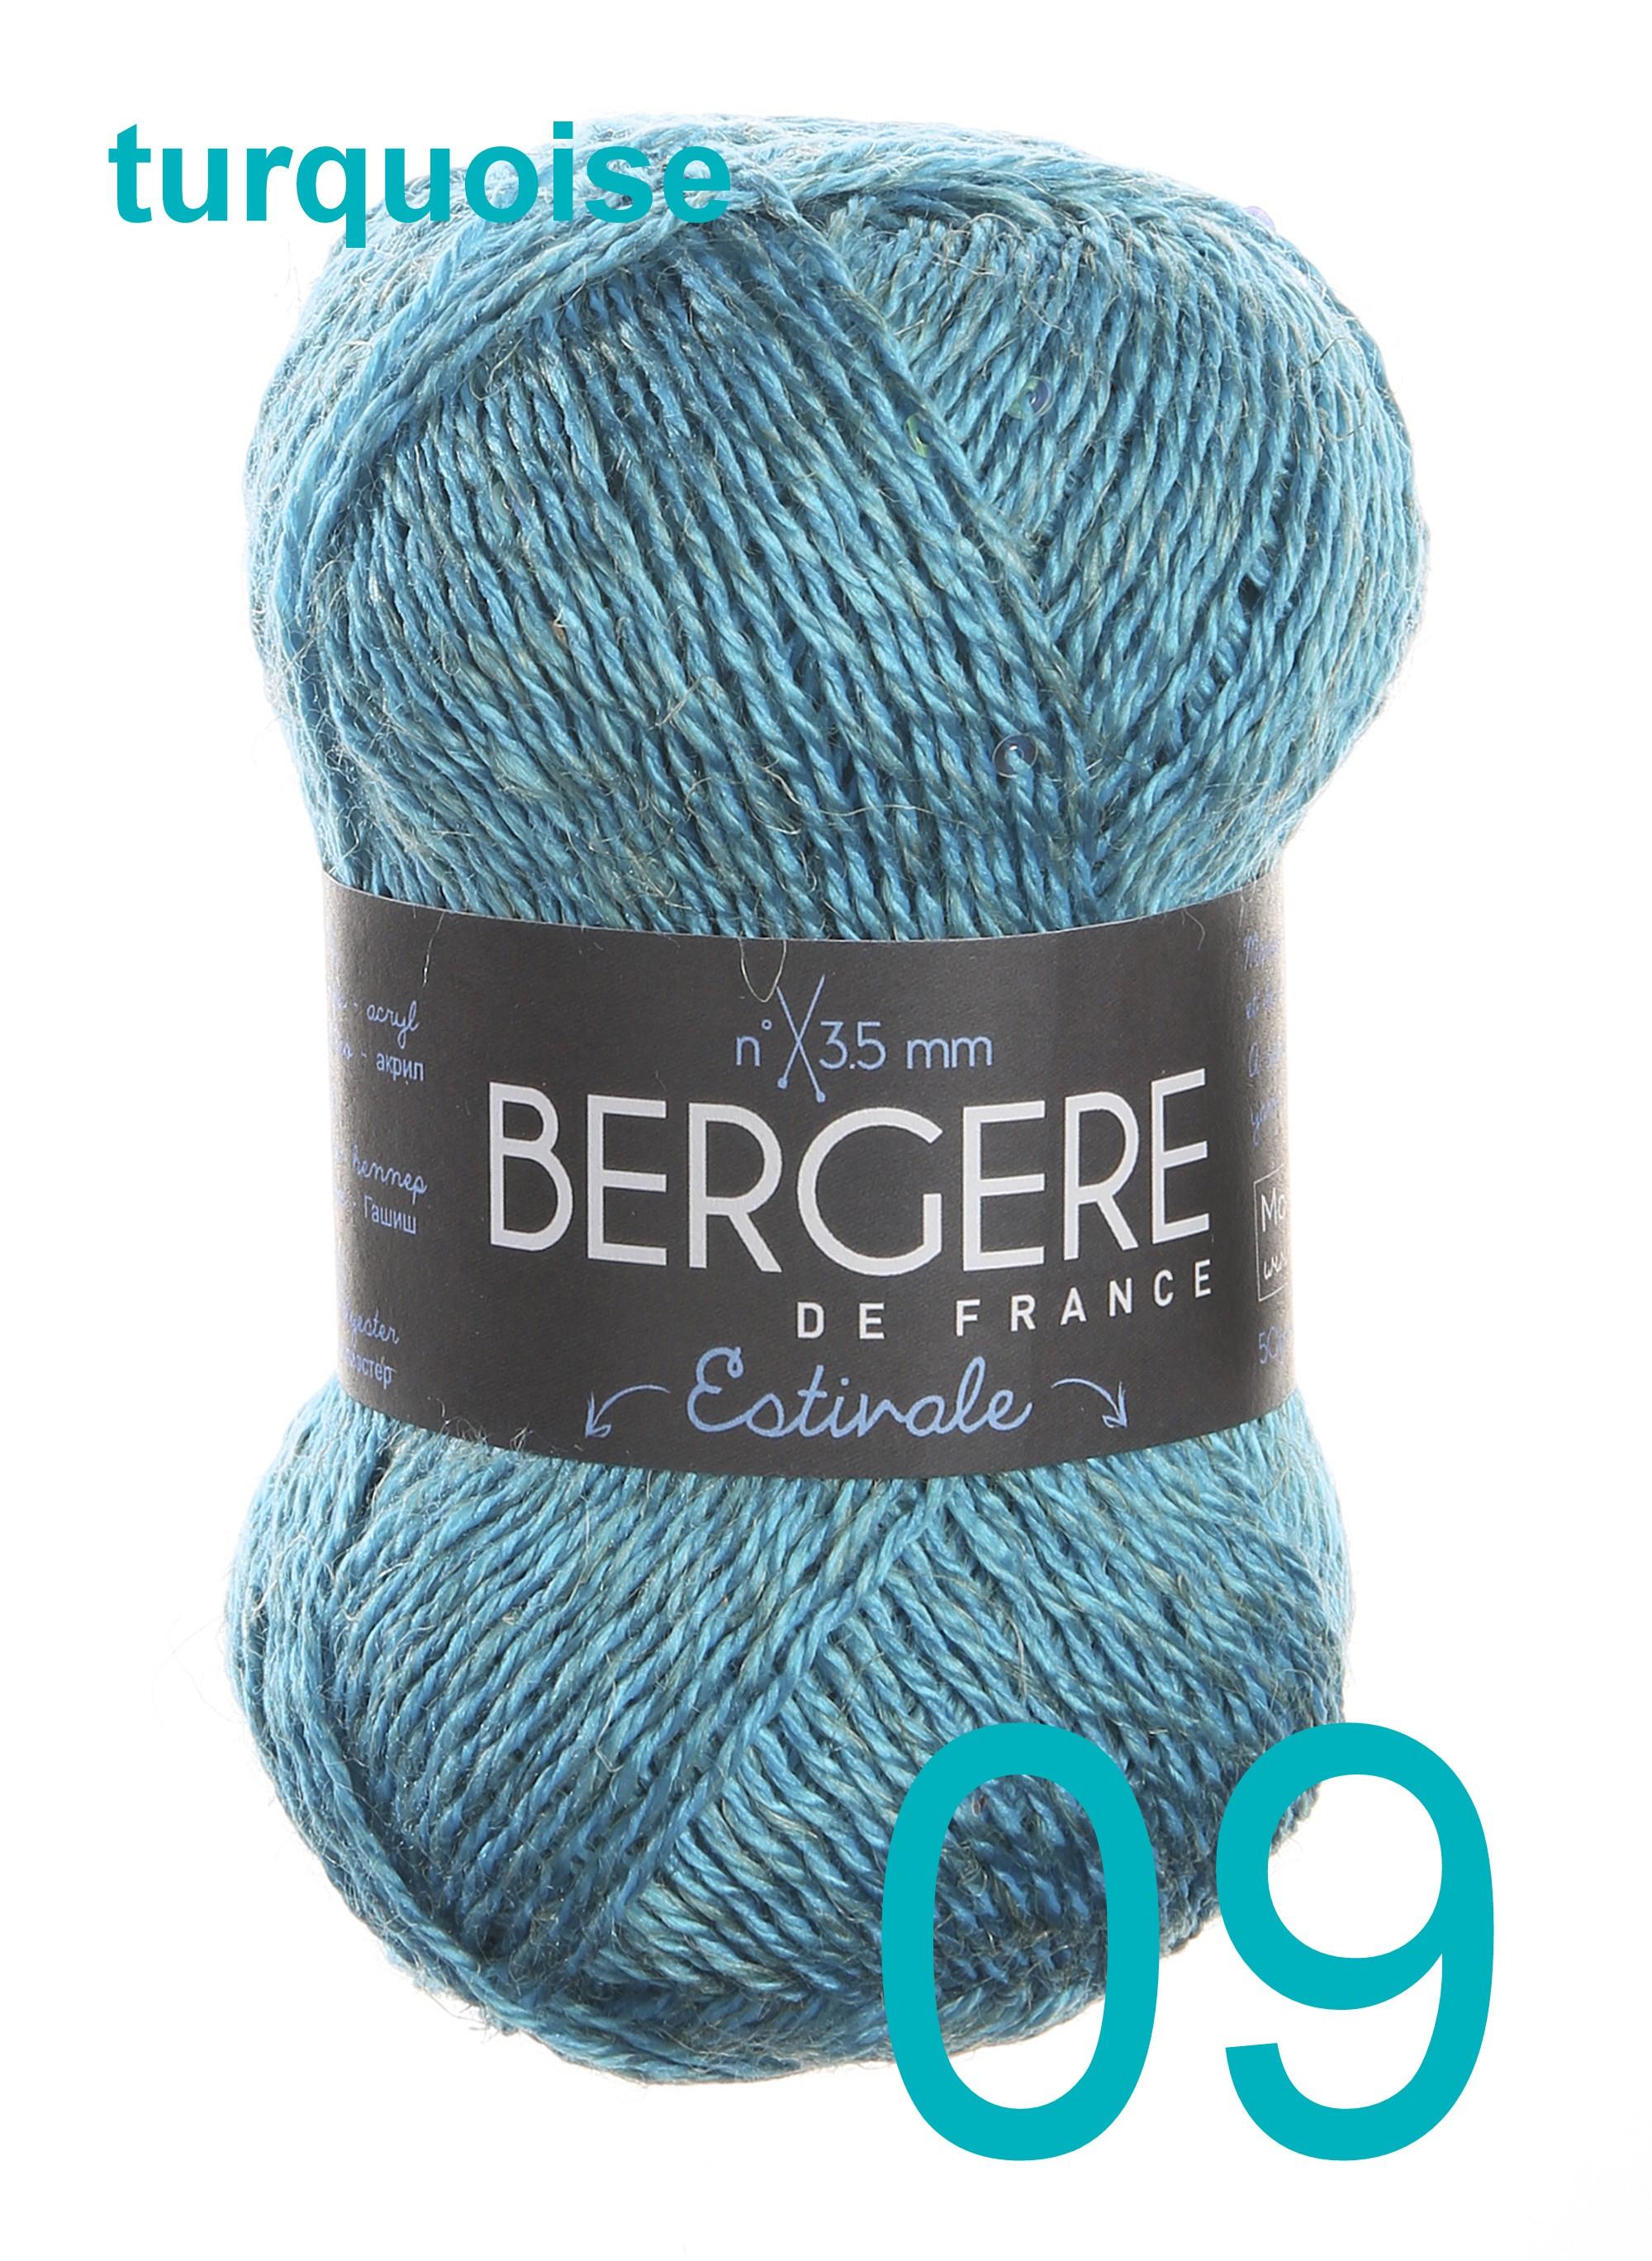 Bergere Estivale turquoise 09